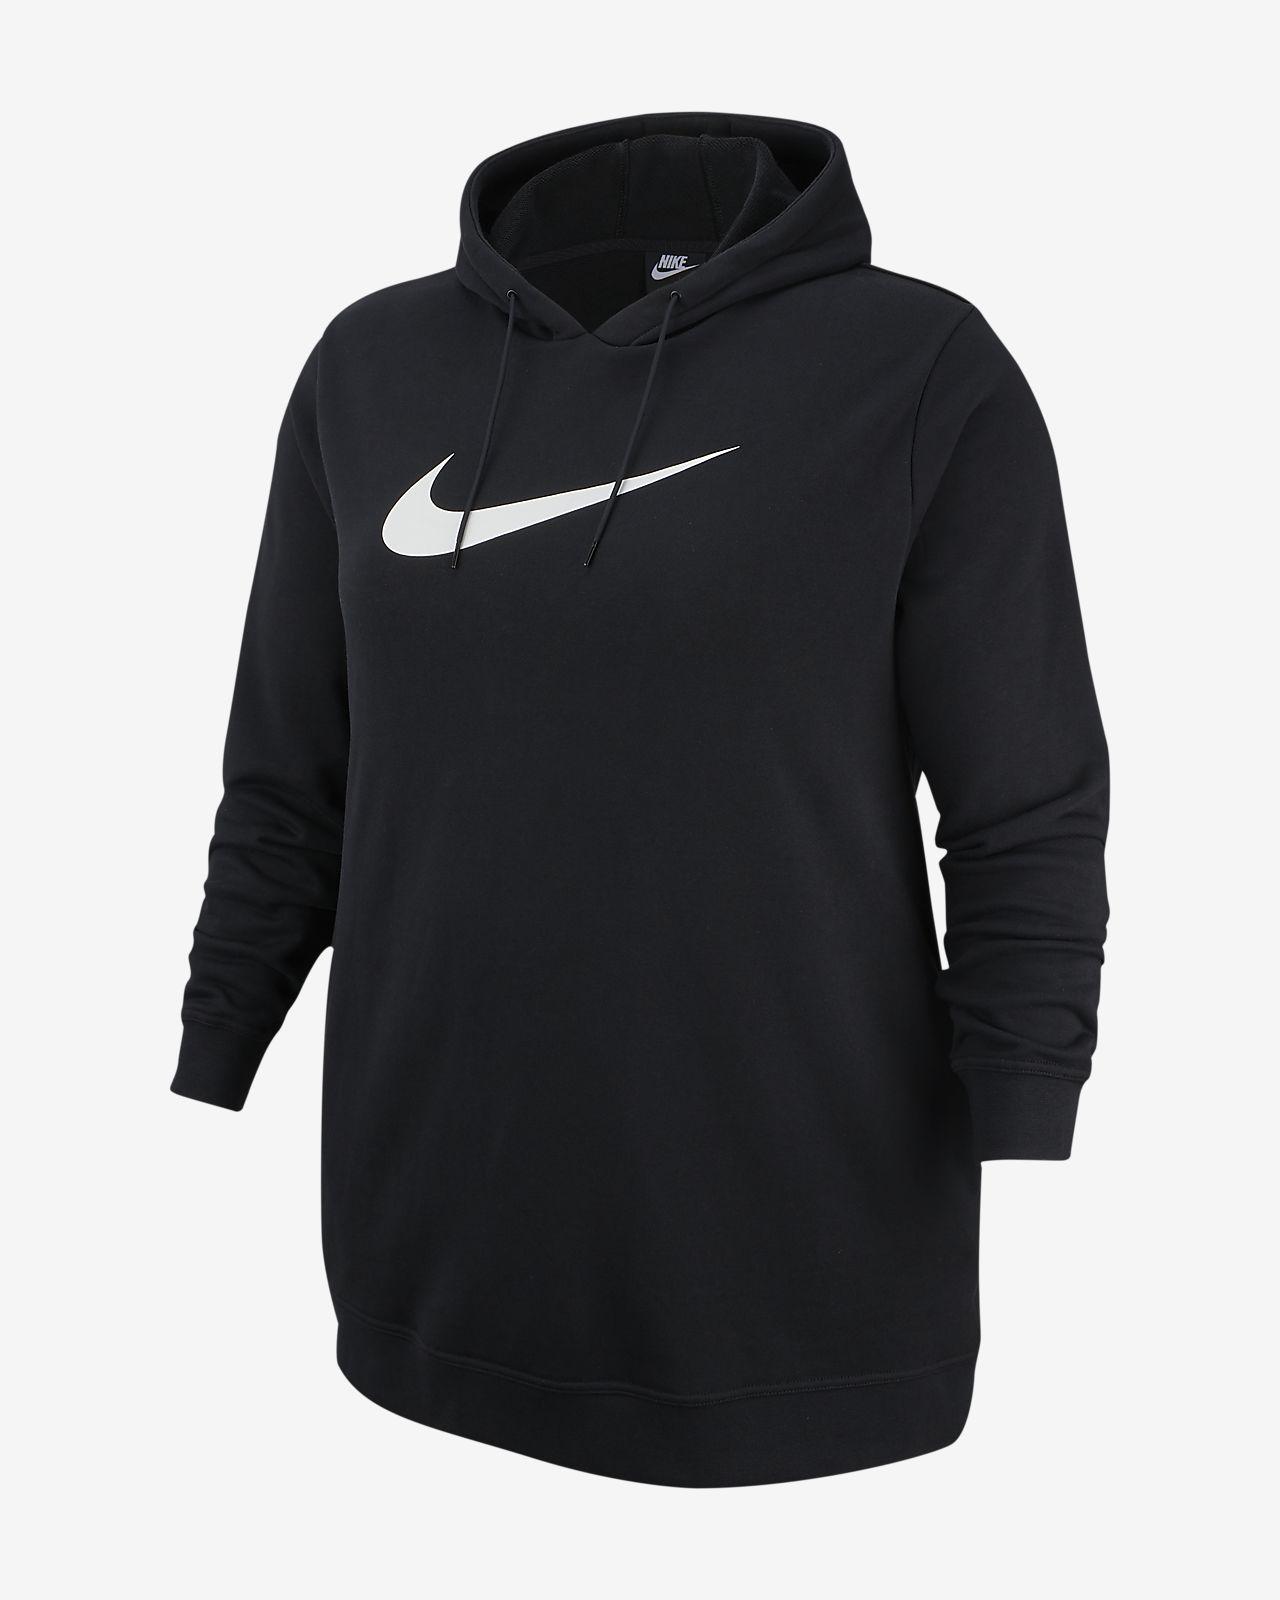 Vestido de felpa francesa para mujer (talla grande) Nike Sportswear Swoosh